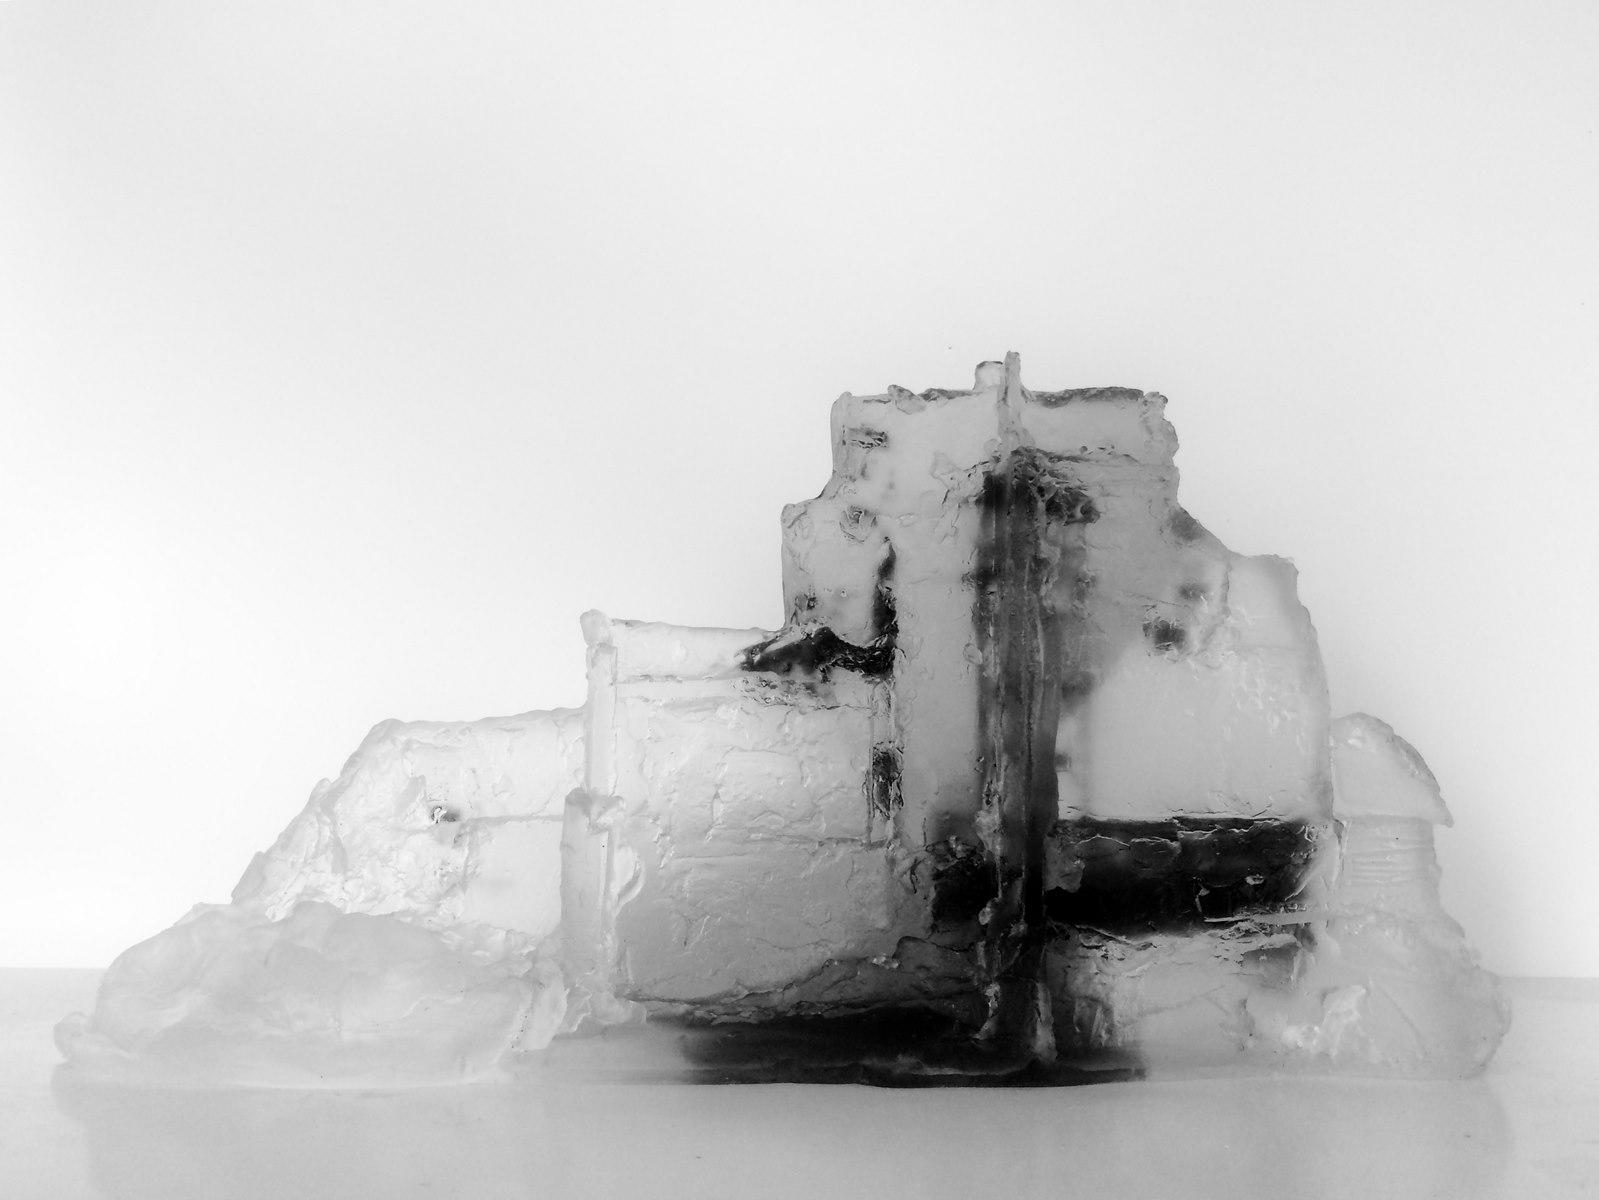 Ruine, pâte de verre, verre gris et incolore, sérigraphie, 2019